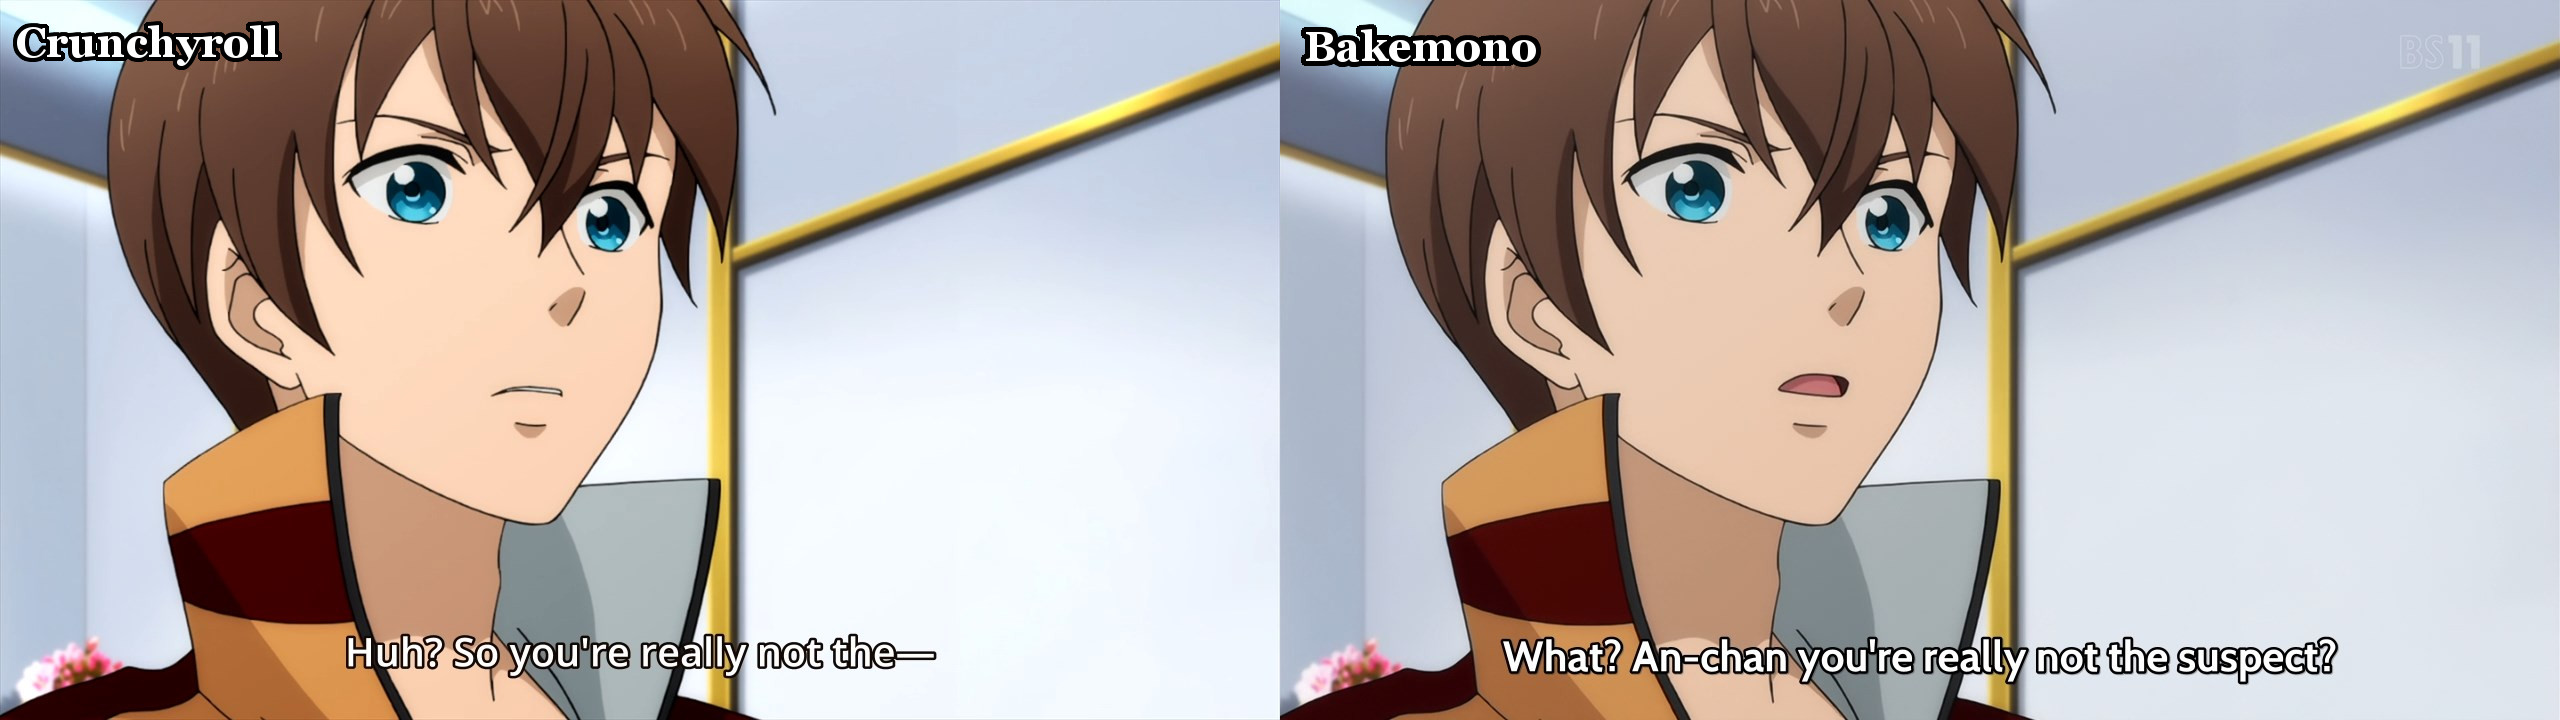 crunchyroll_versus_bakemono_-_trickster_-_7nvc